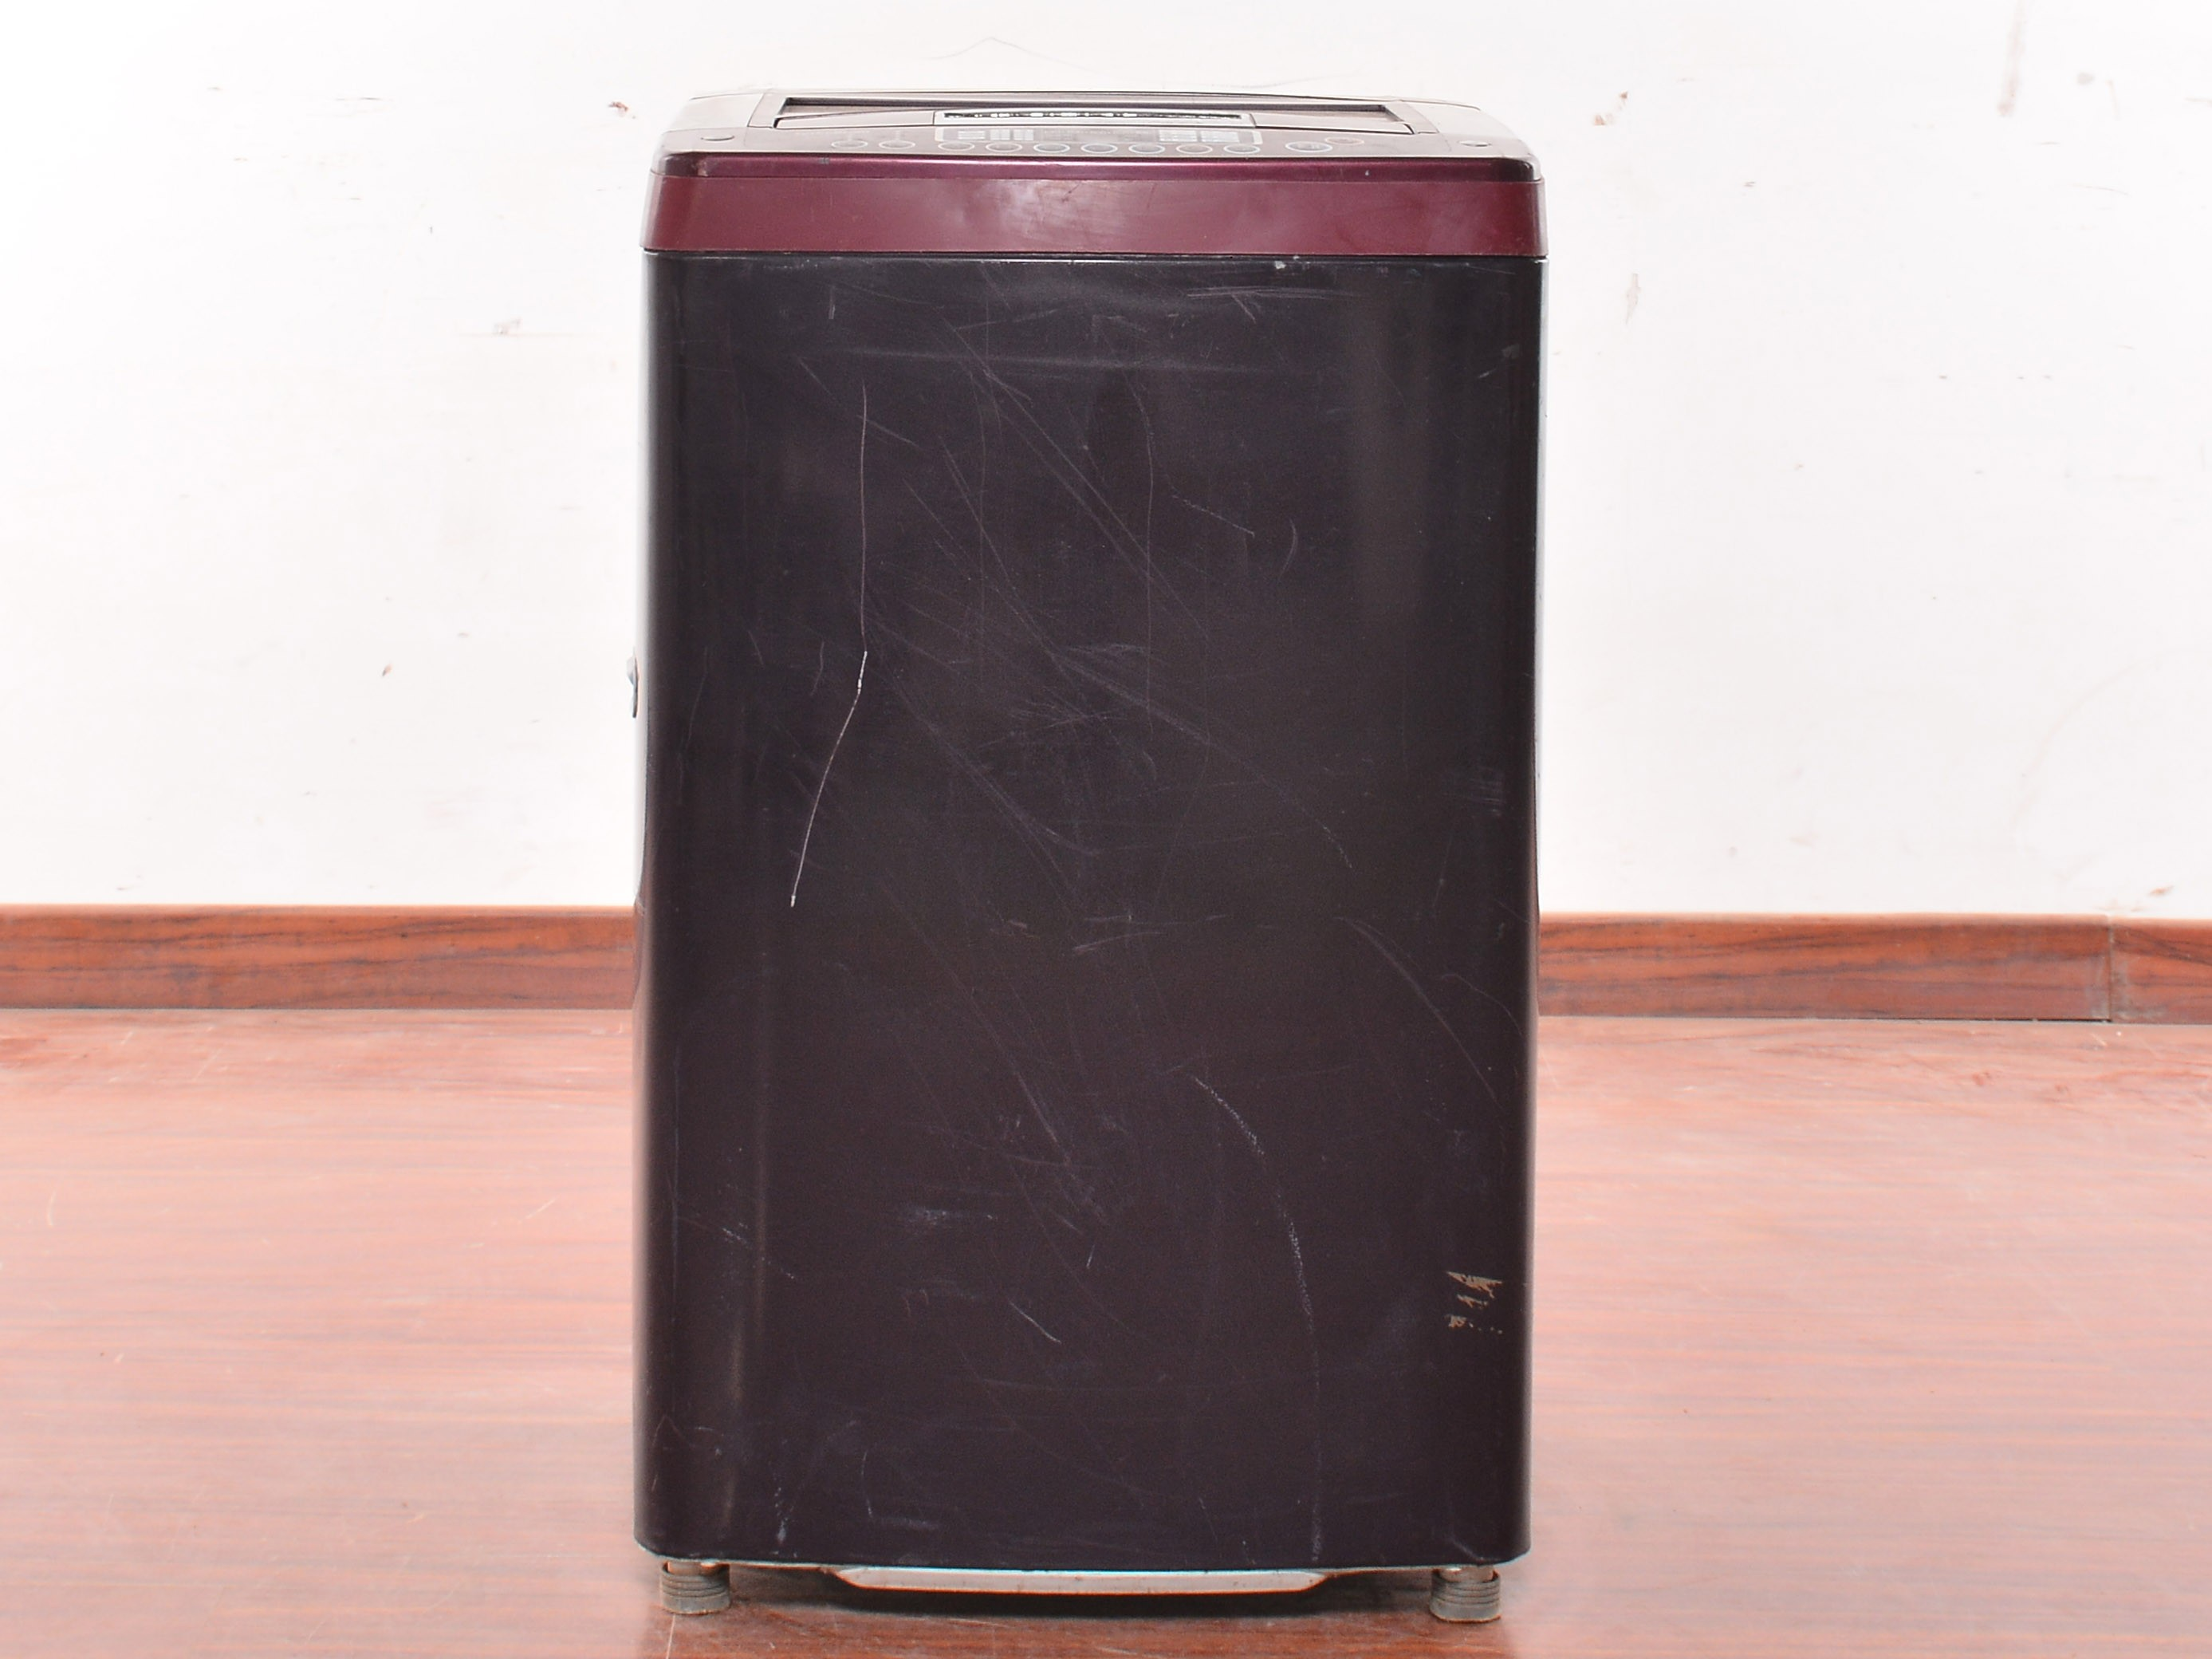 LG WF-T8019QV Image